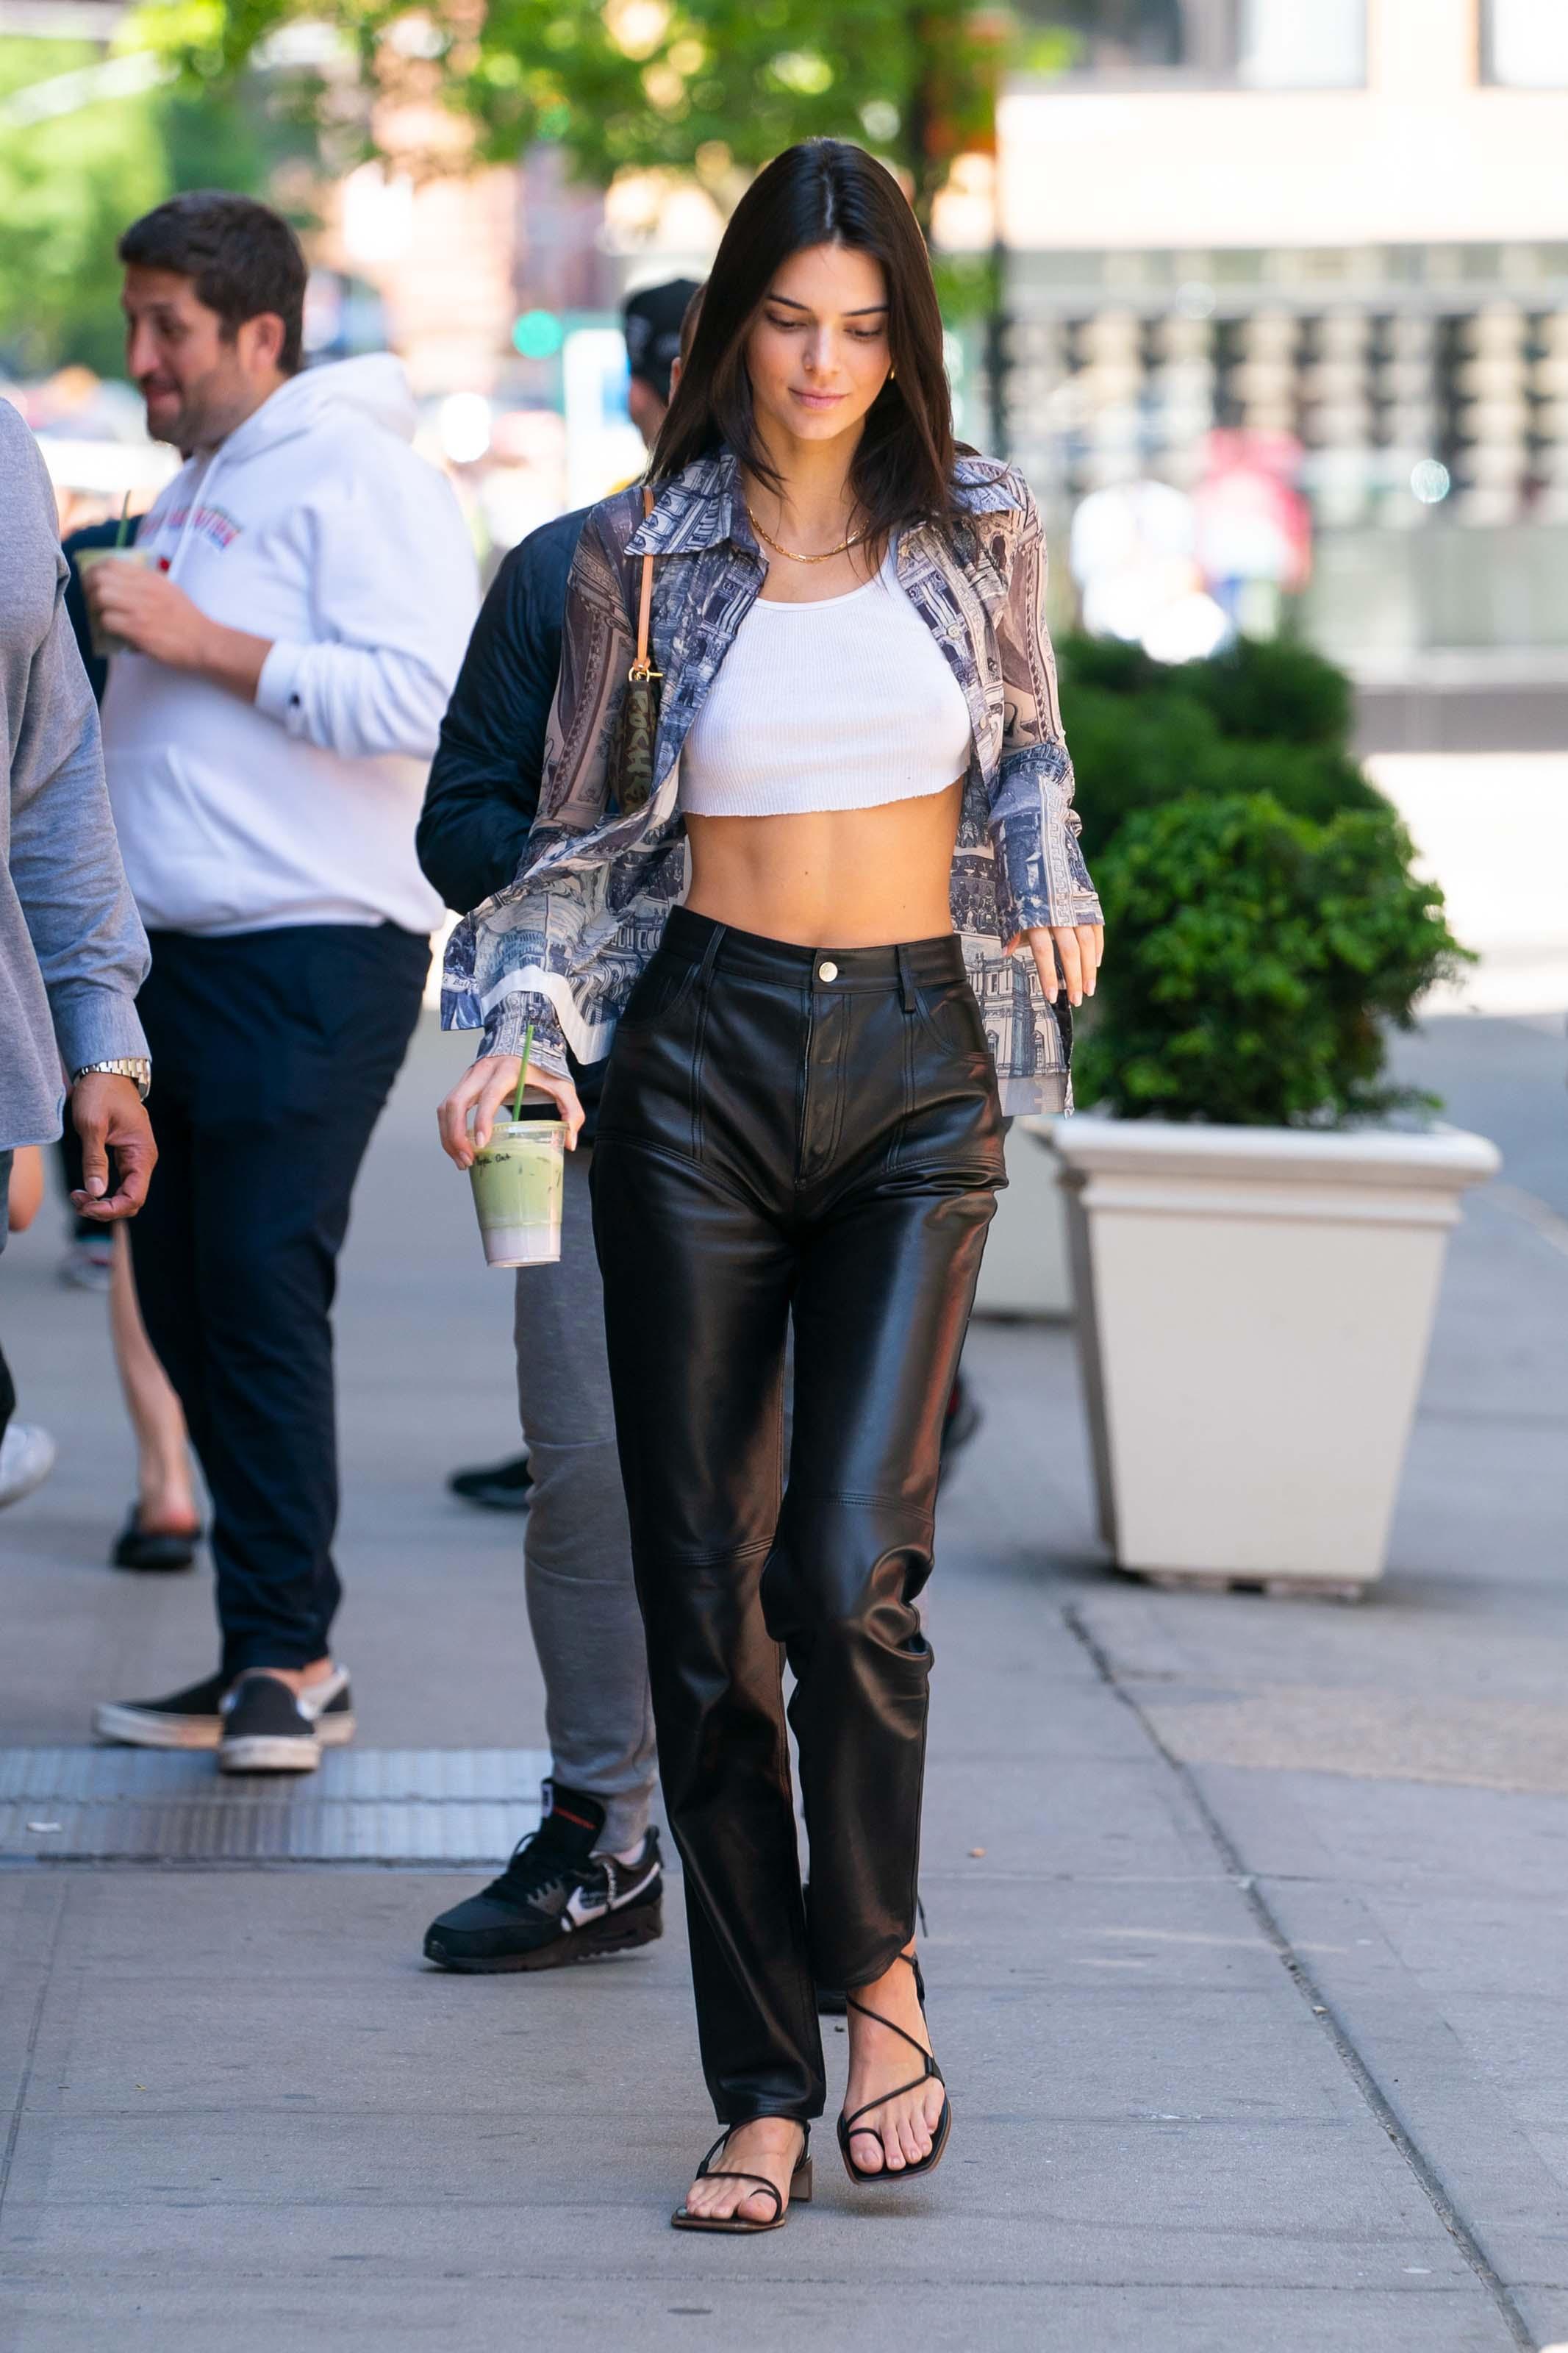 Kendall Jenner leaving Chacha Matcha